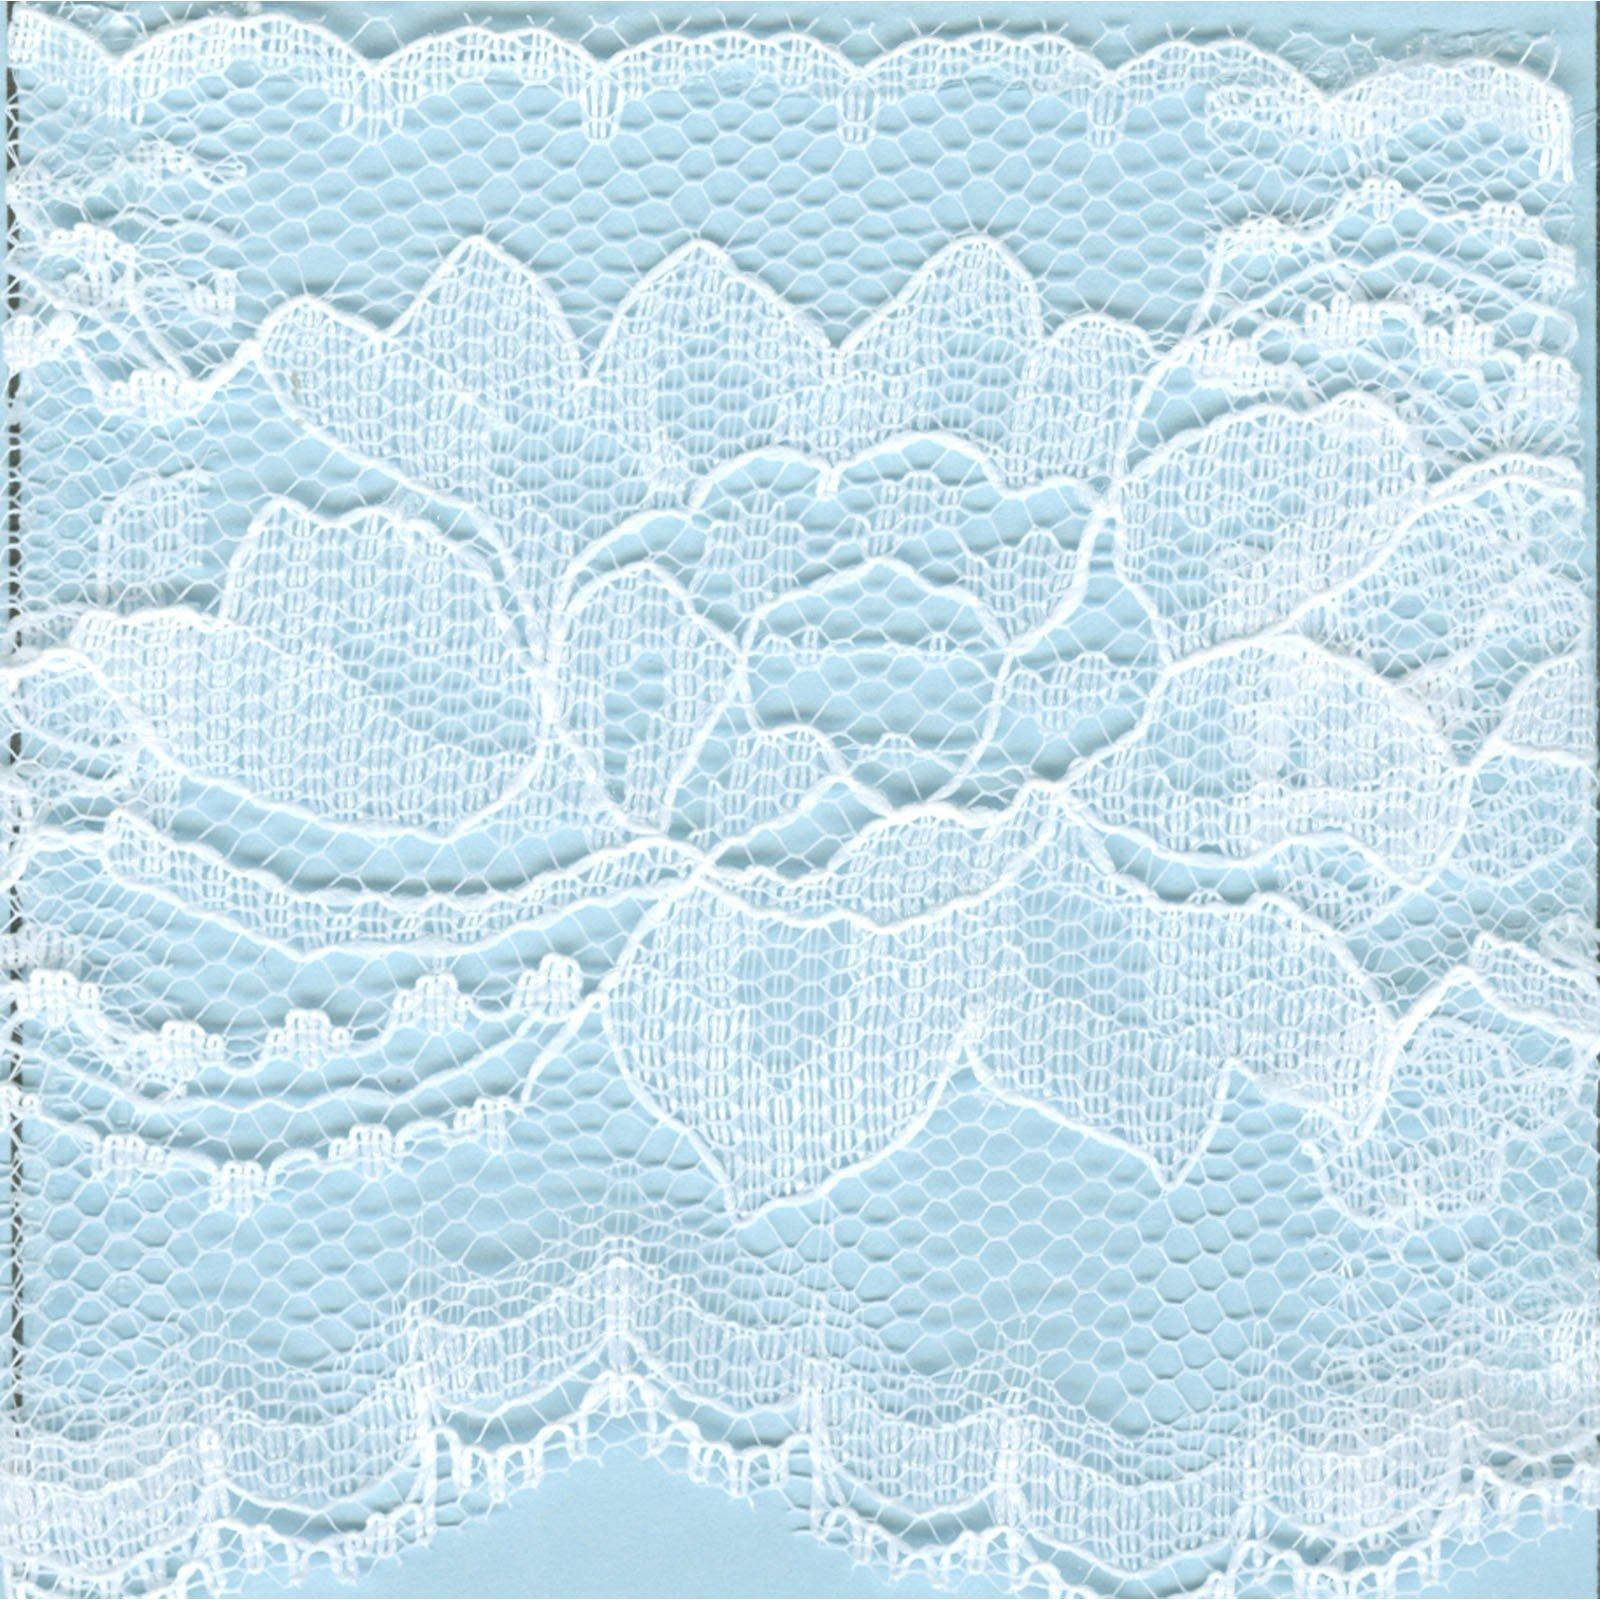 Lace 2.38 Flat Edge - White